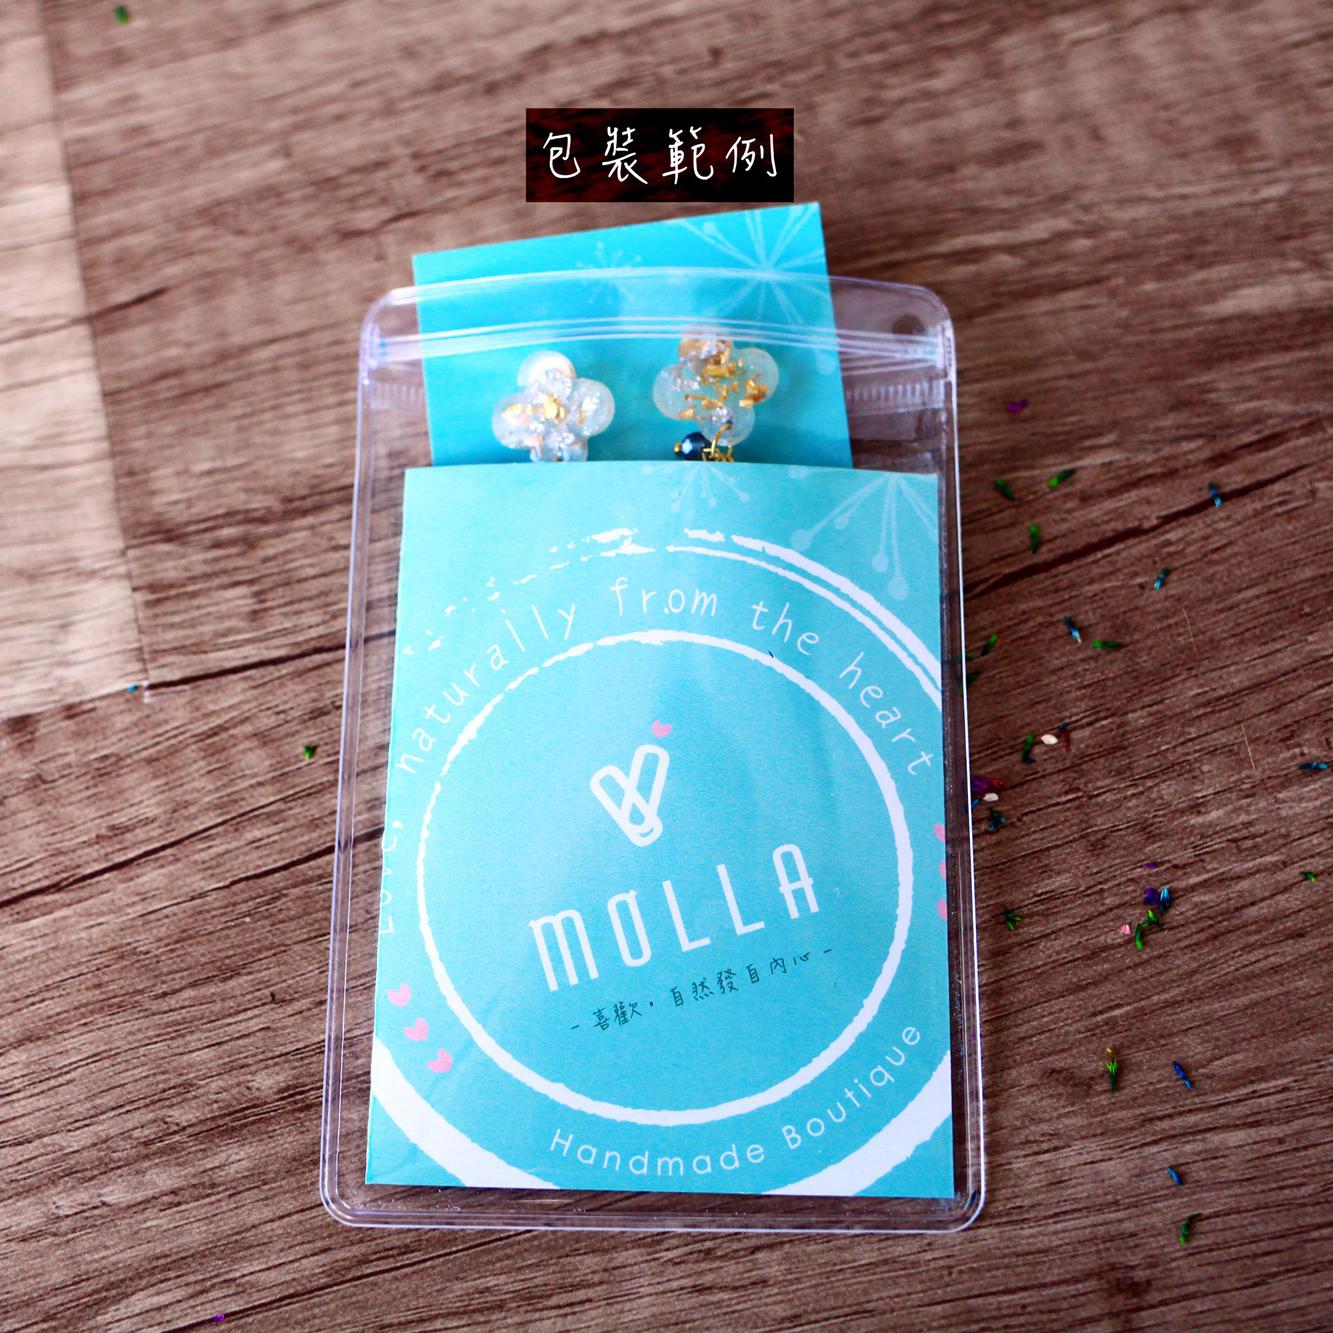 Molla 小圓水滴耳環-希臘藍(FLAMENCO佛朗明哥舞者最愛-純銀針手工訂製)